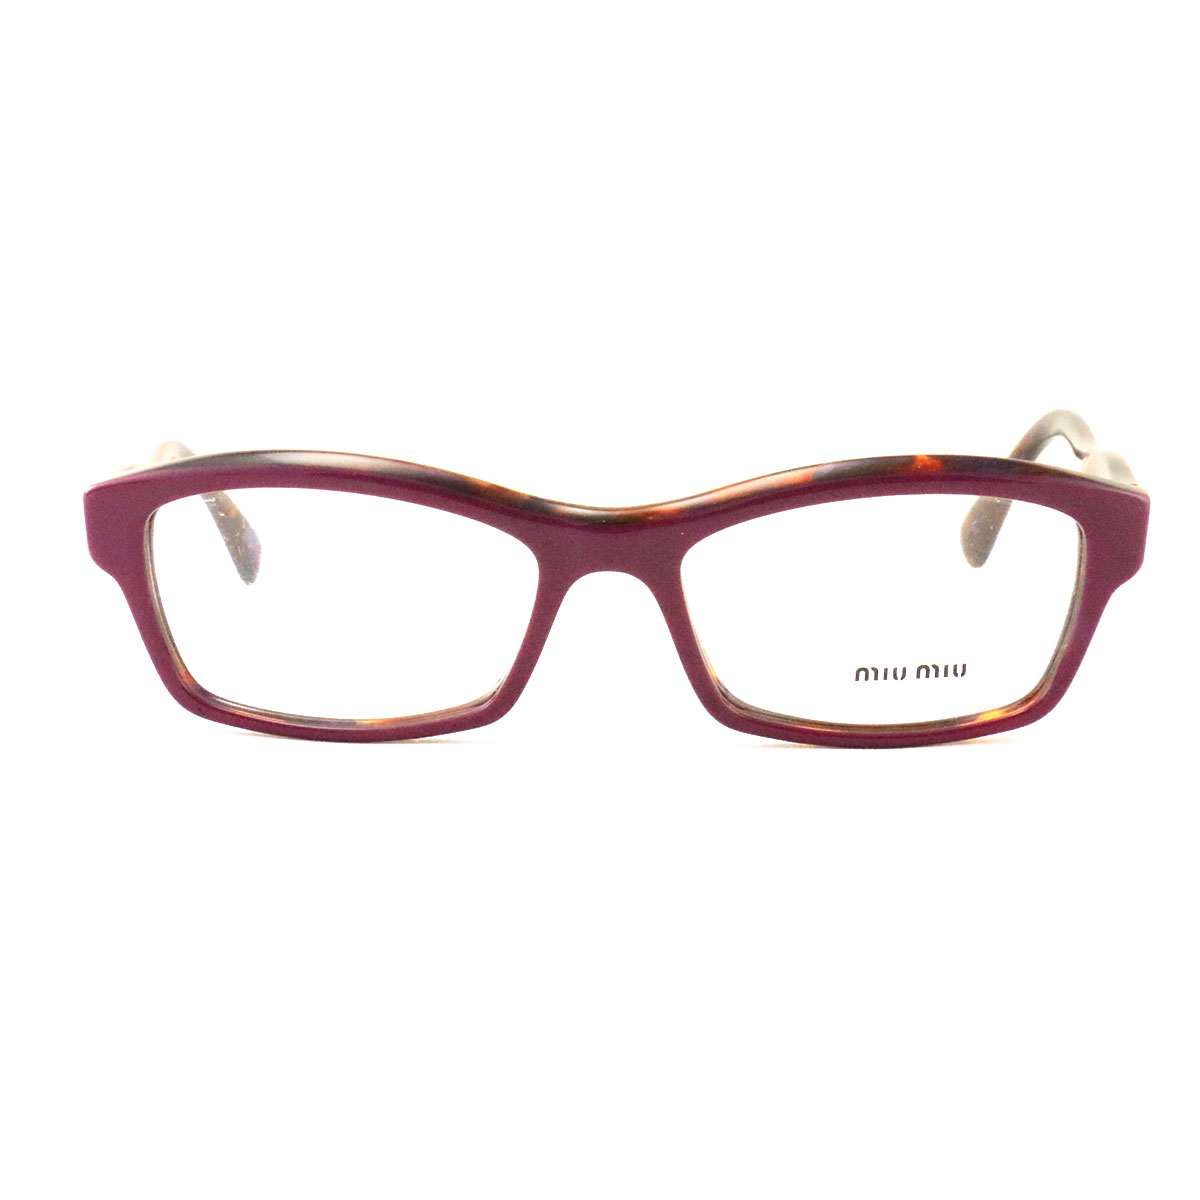 079b53125c0 New Miu Miu Eyeglasses VMU 021I PC4 101 Lilac-Havana Acetate 52 16 ...